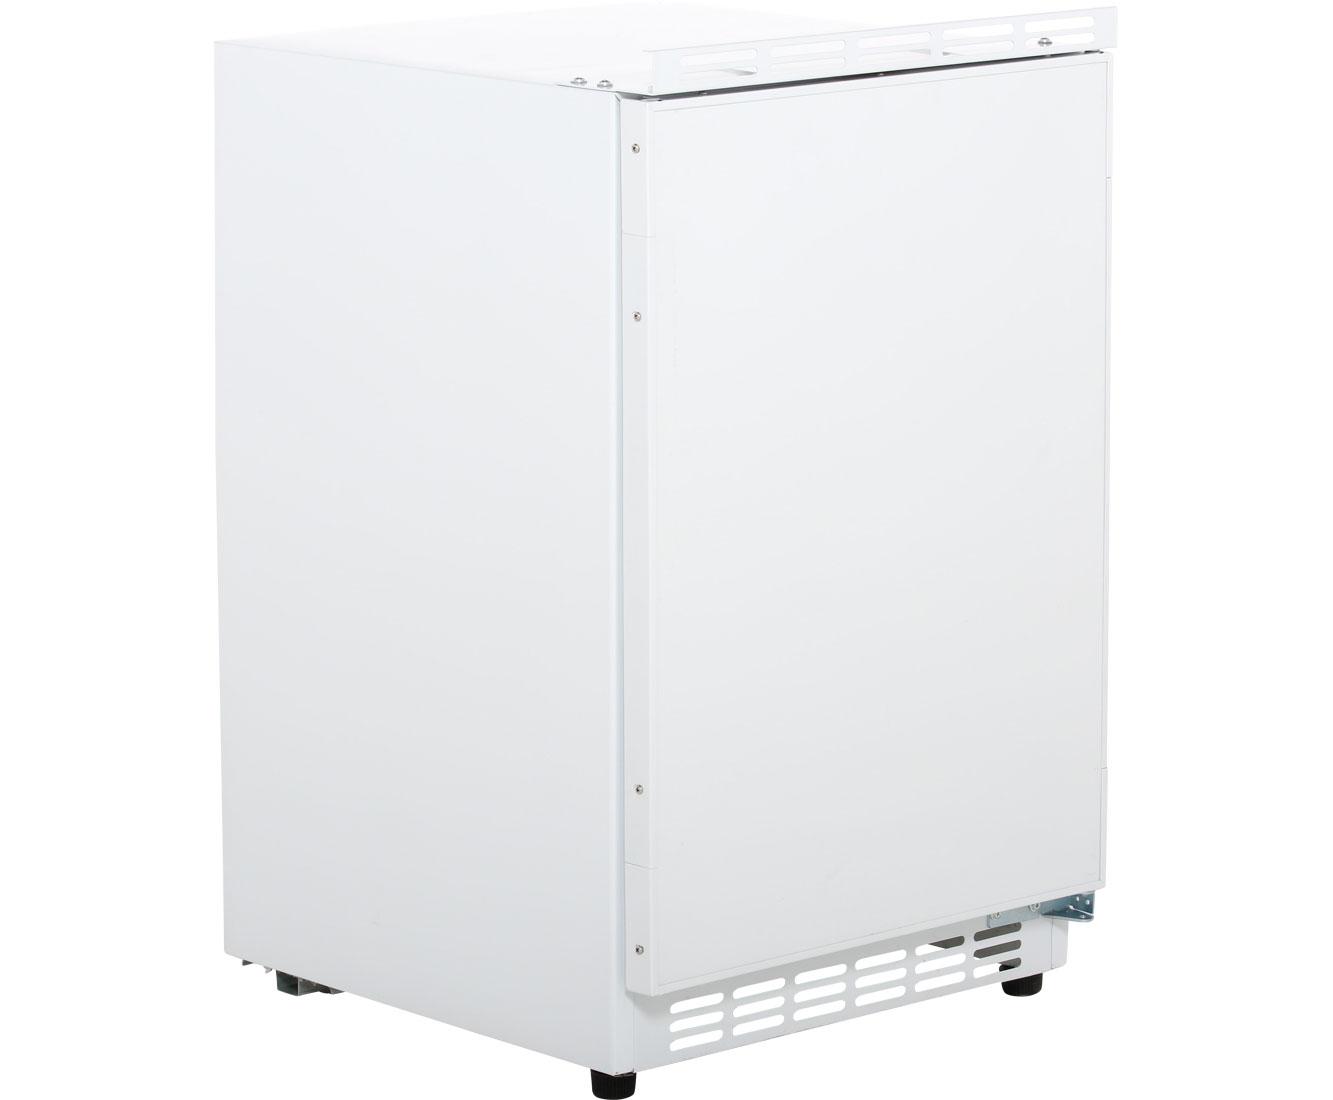 Amica Kühlschrank 50 Cm : Amica uks kühlschrank unterbau cm weiss neu ebay